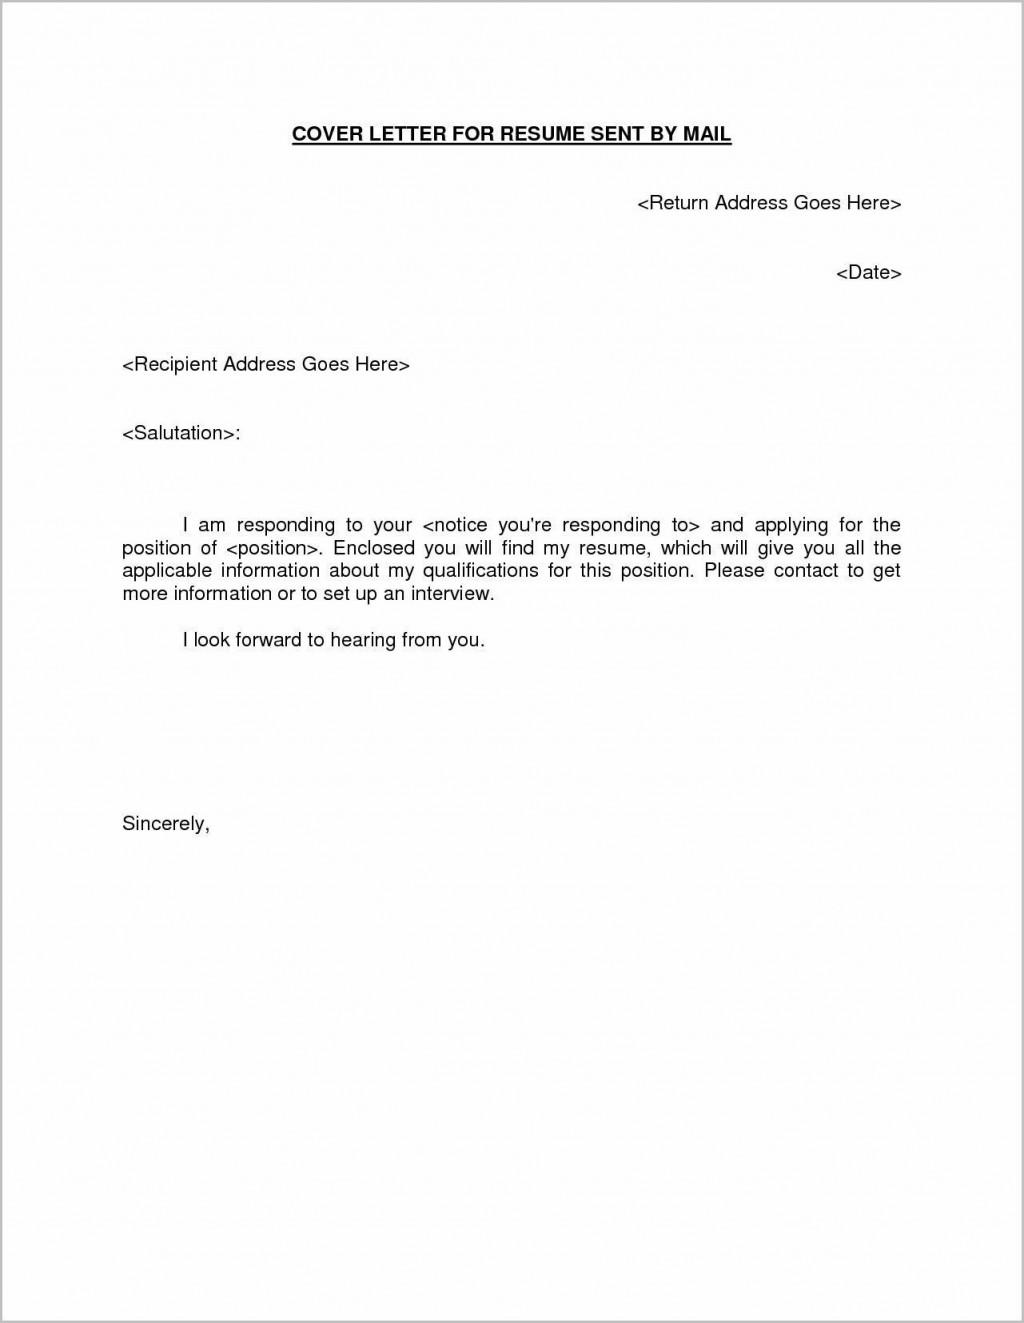 001 Imposing Email Cover Letter Sample Inspiration  Samples Resume Example Of For Job InternshipLarge